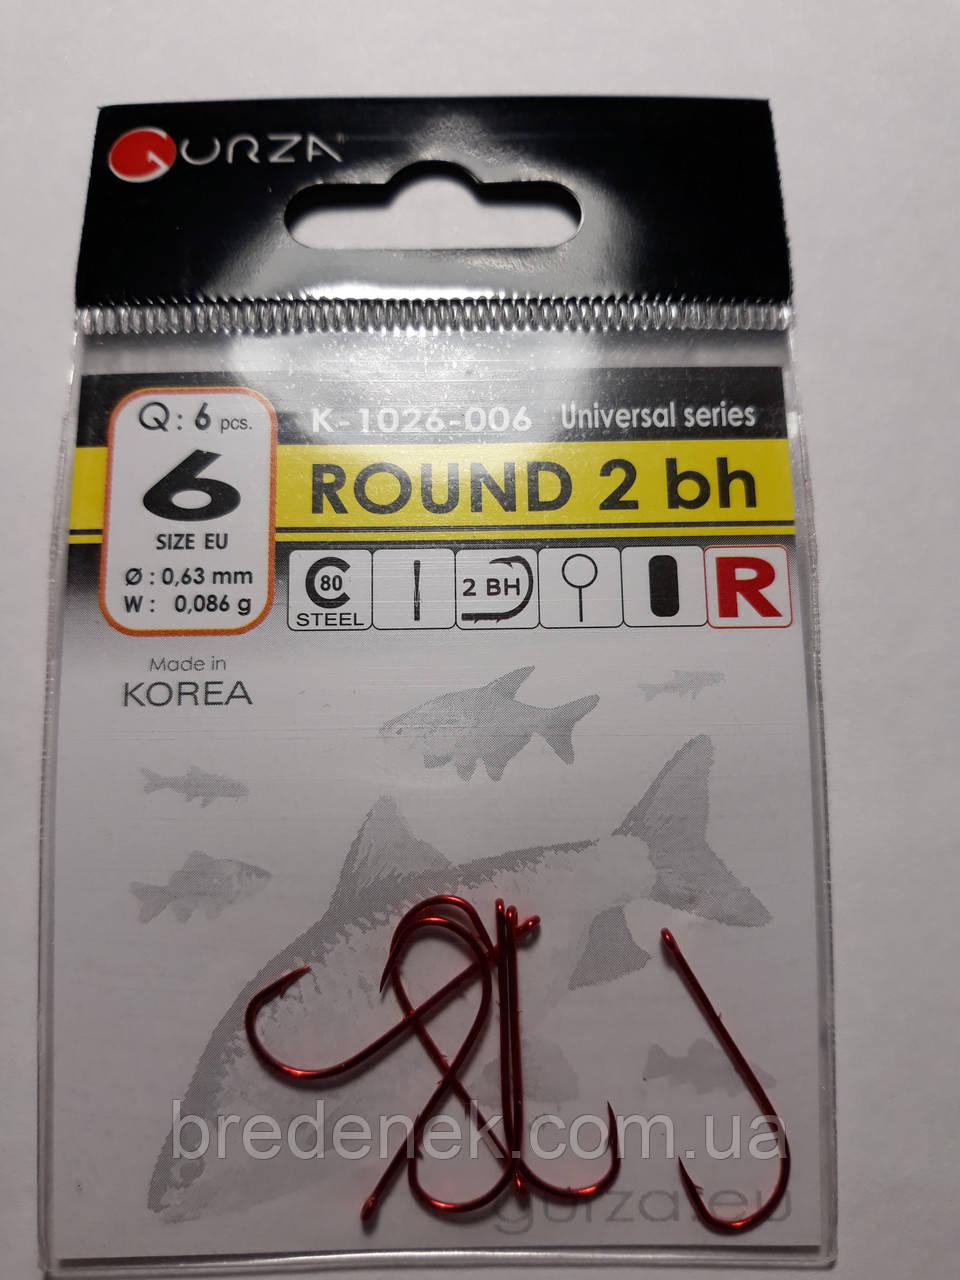 Крючки Gurza round red 2 bh № 6